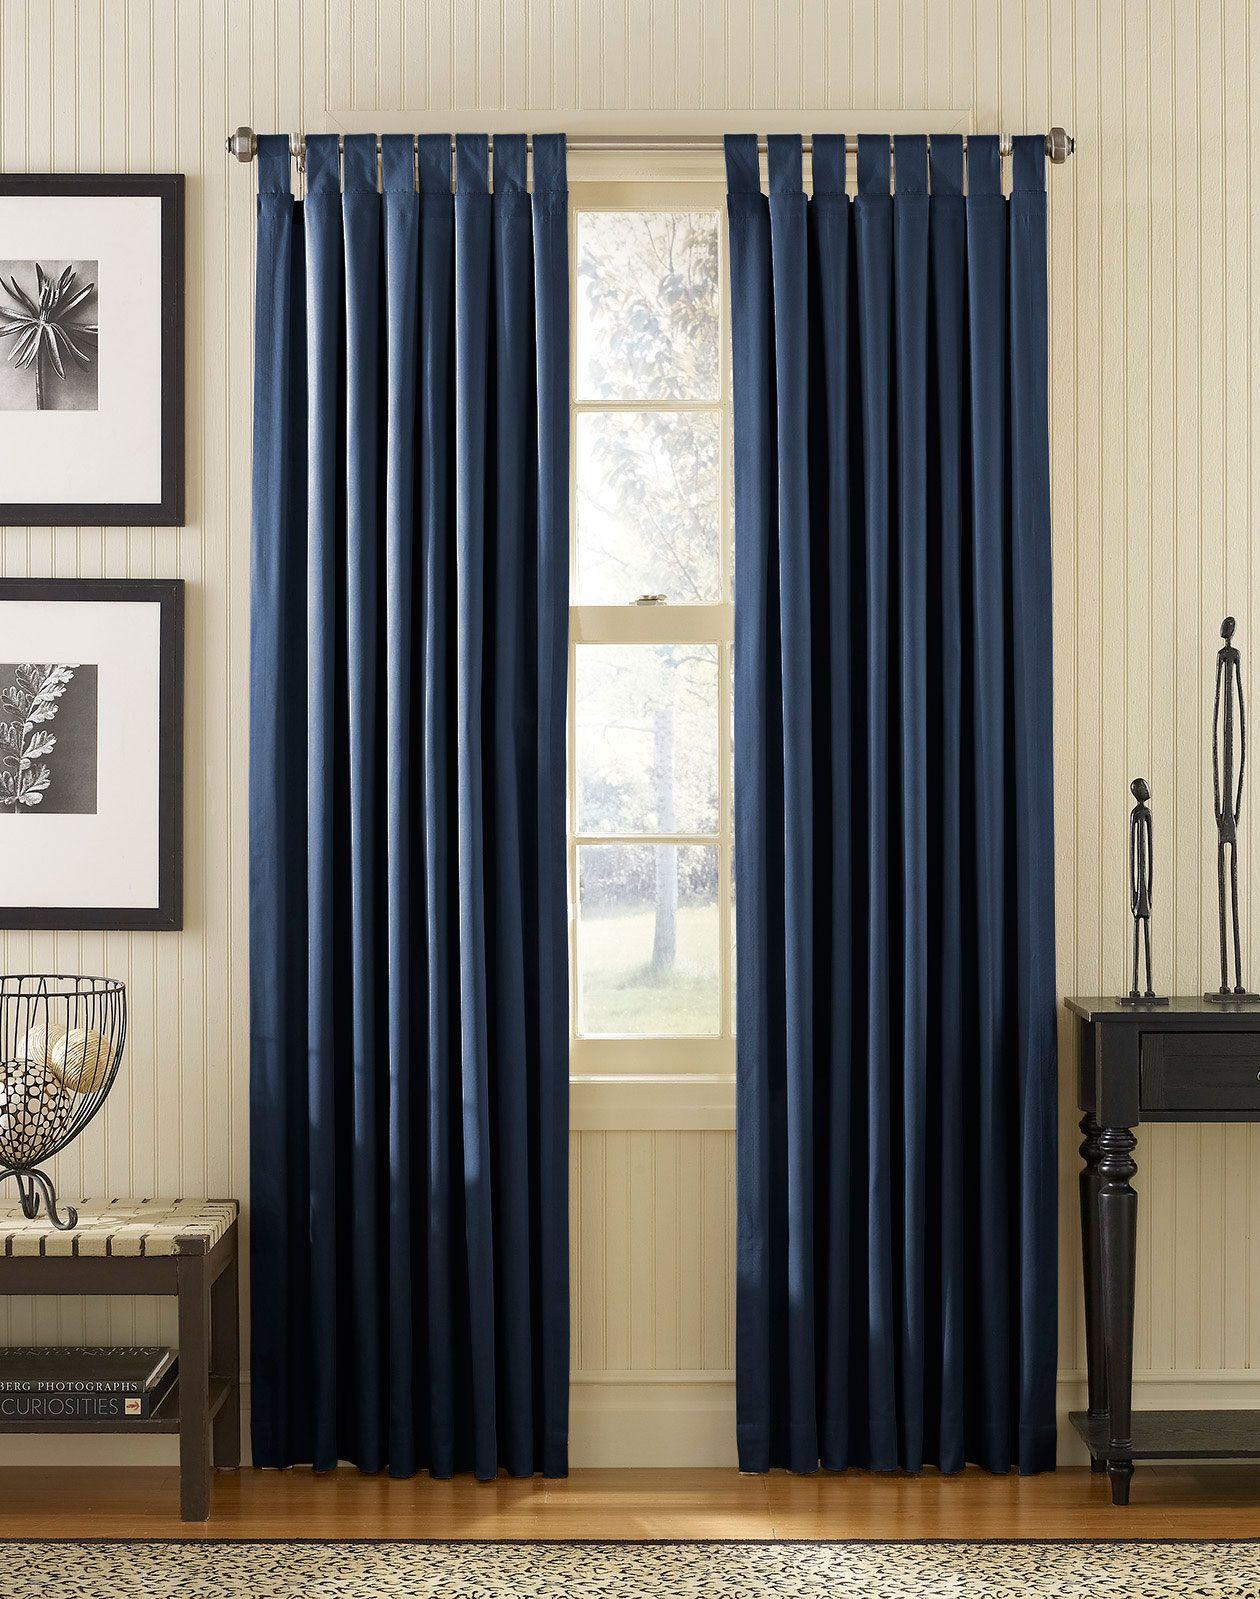 blue bedroom curtain ideas | design ideas 2017-2018 | pinterest